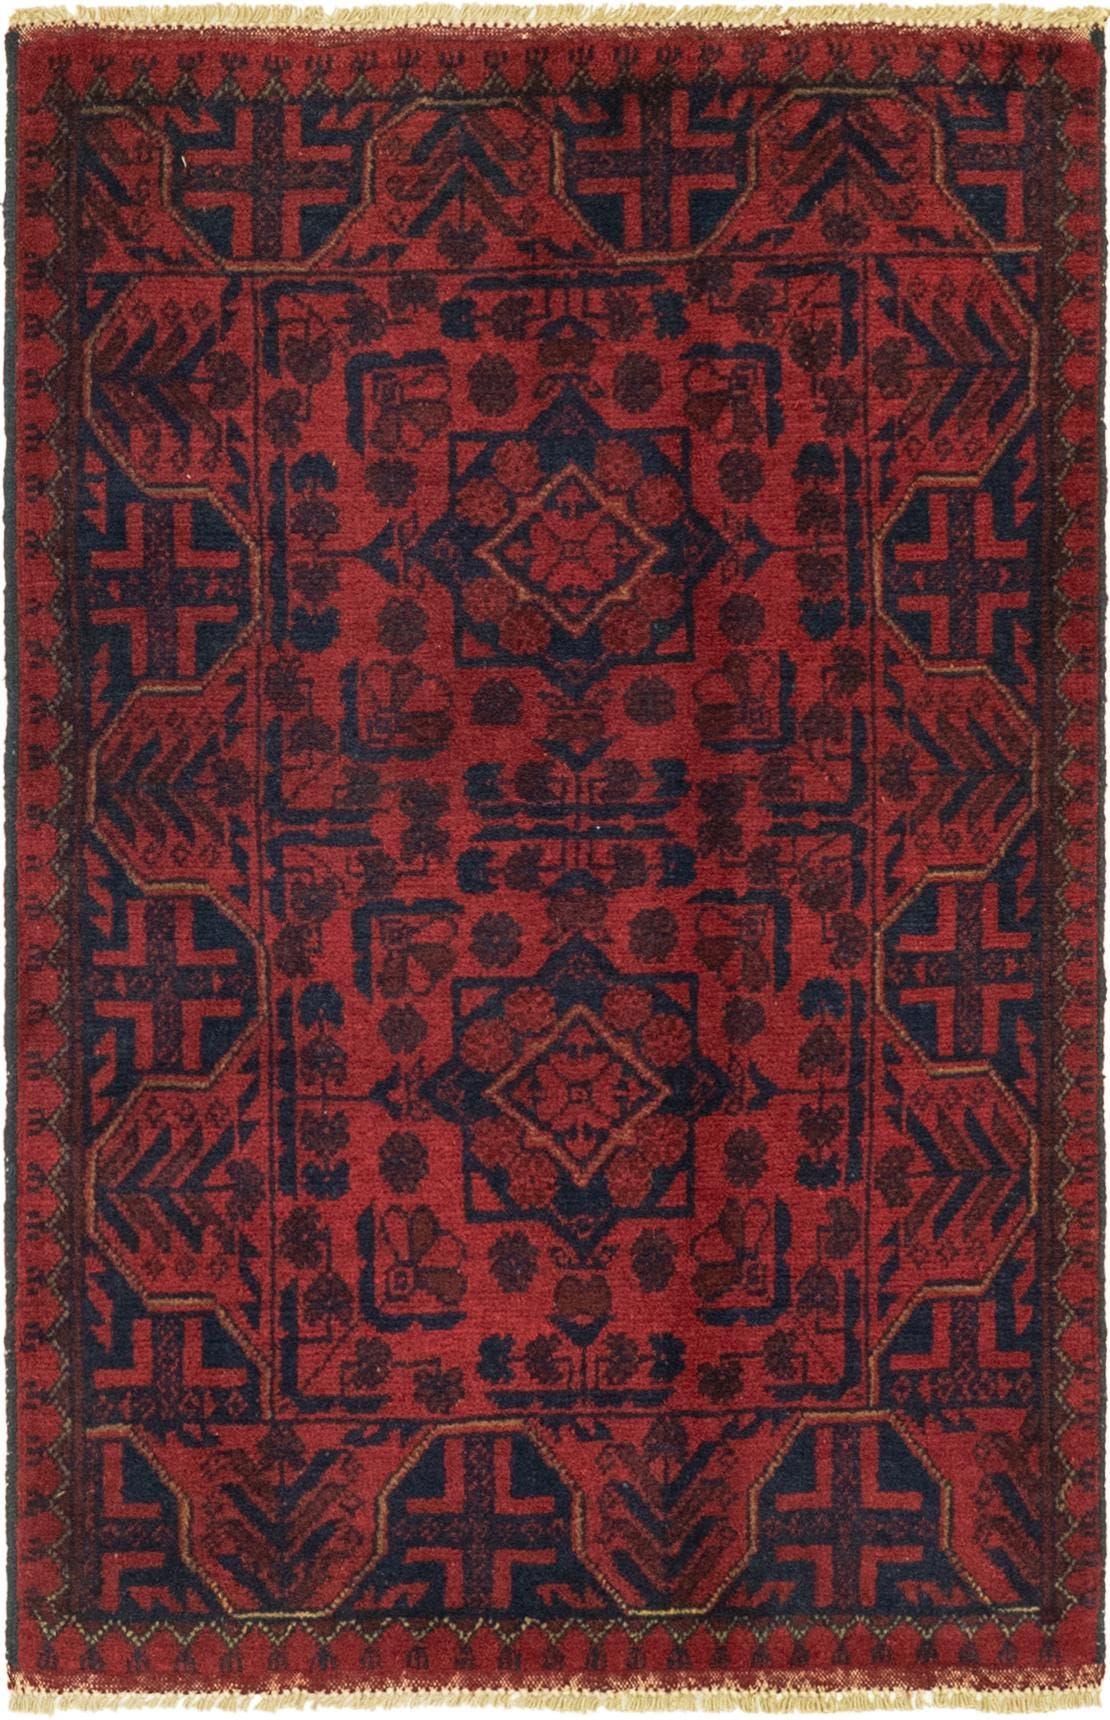 2' 7 x 4' 1 Khal Mohammadi Rug main image